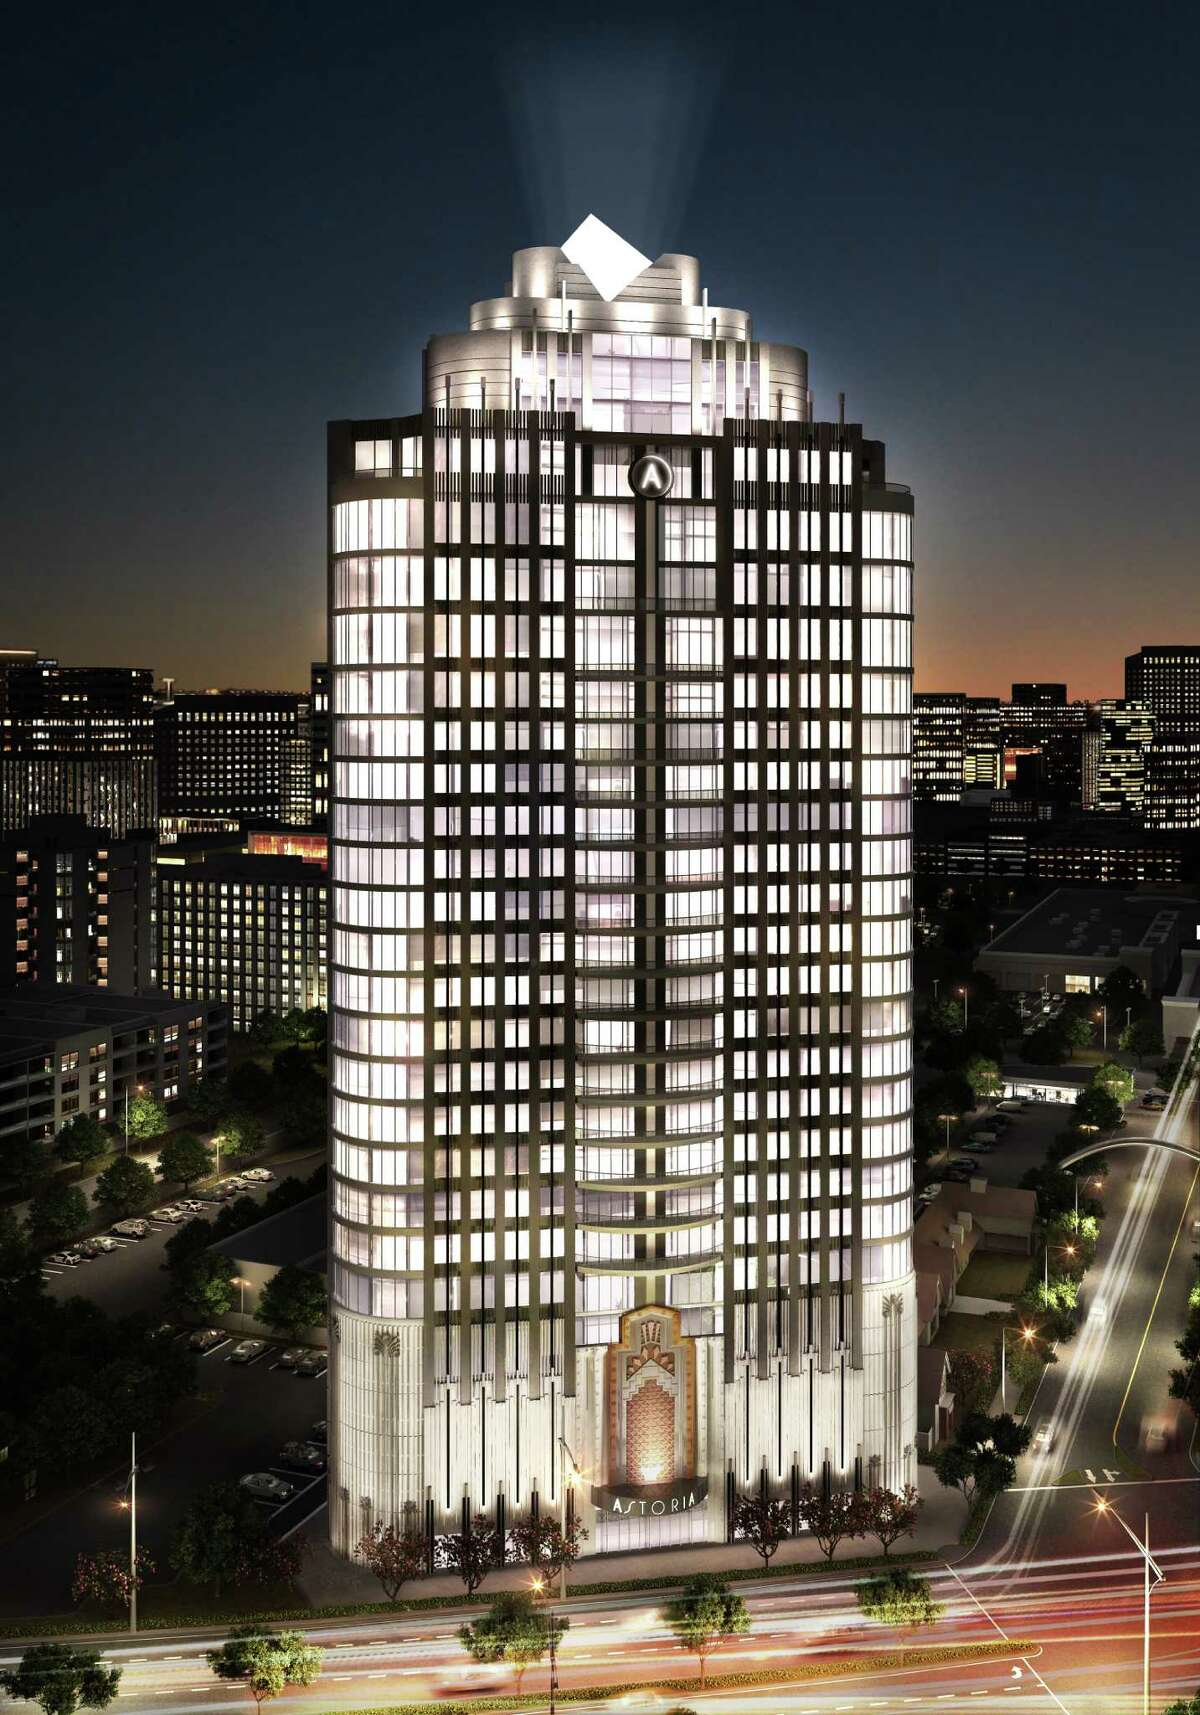 A rendering of Astoria, a condominium building under construction on Post Oak Boulevard.